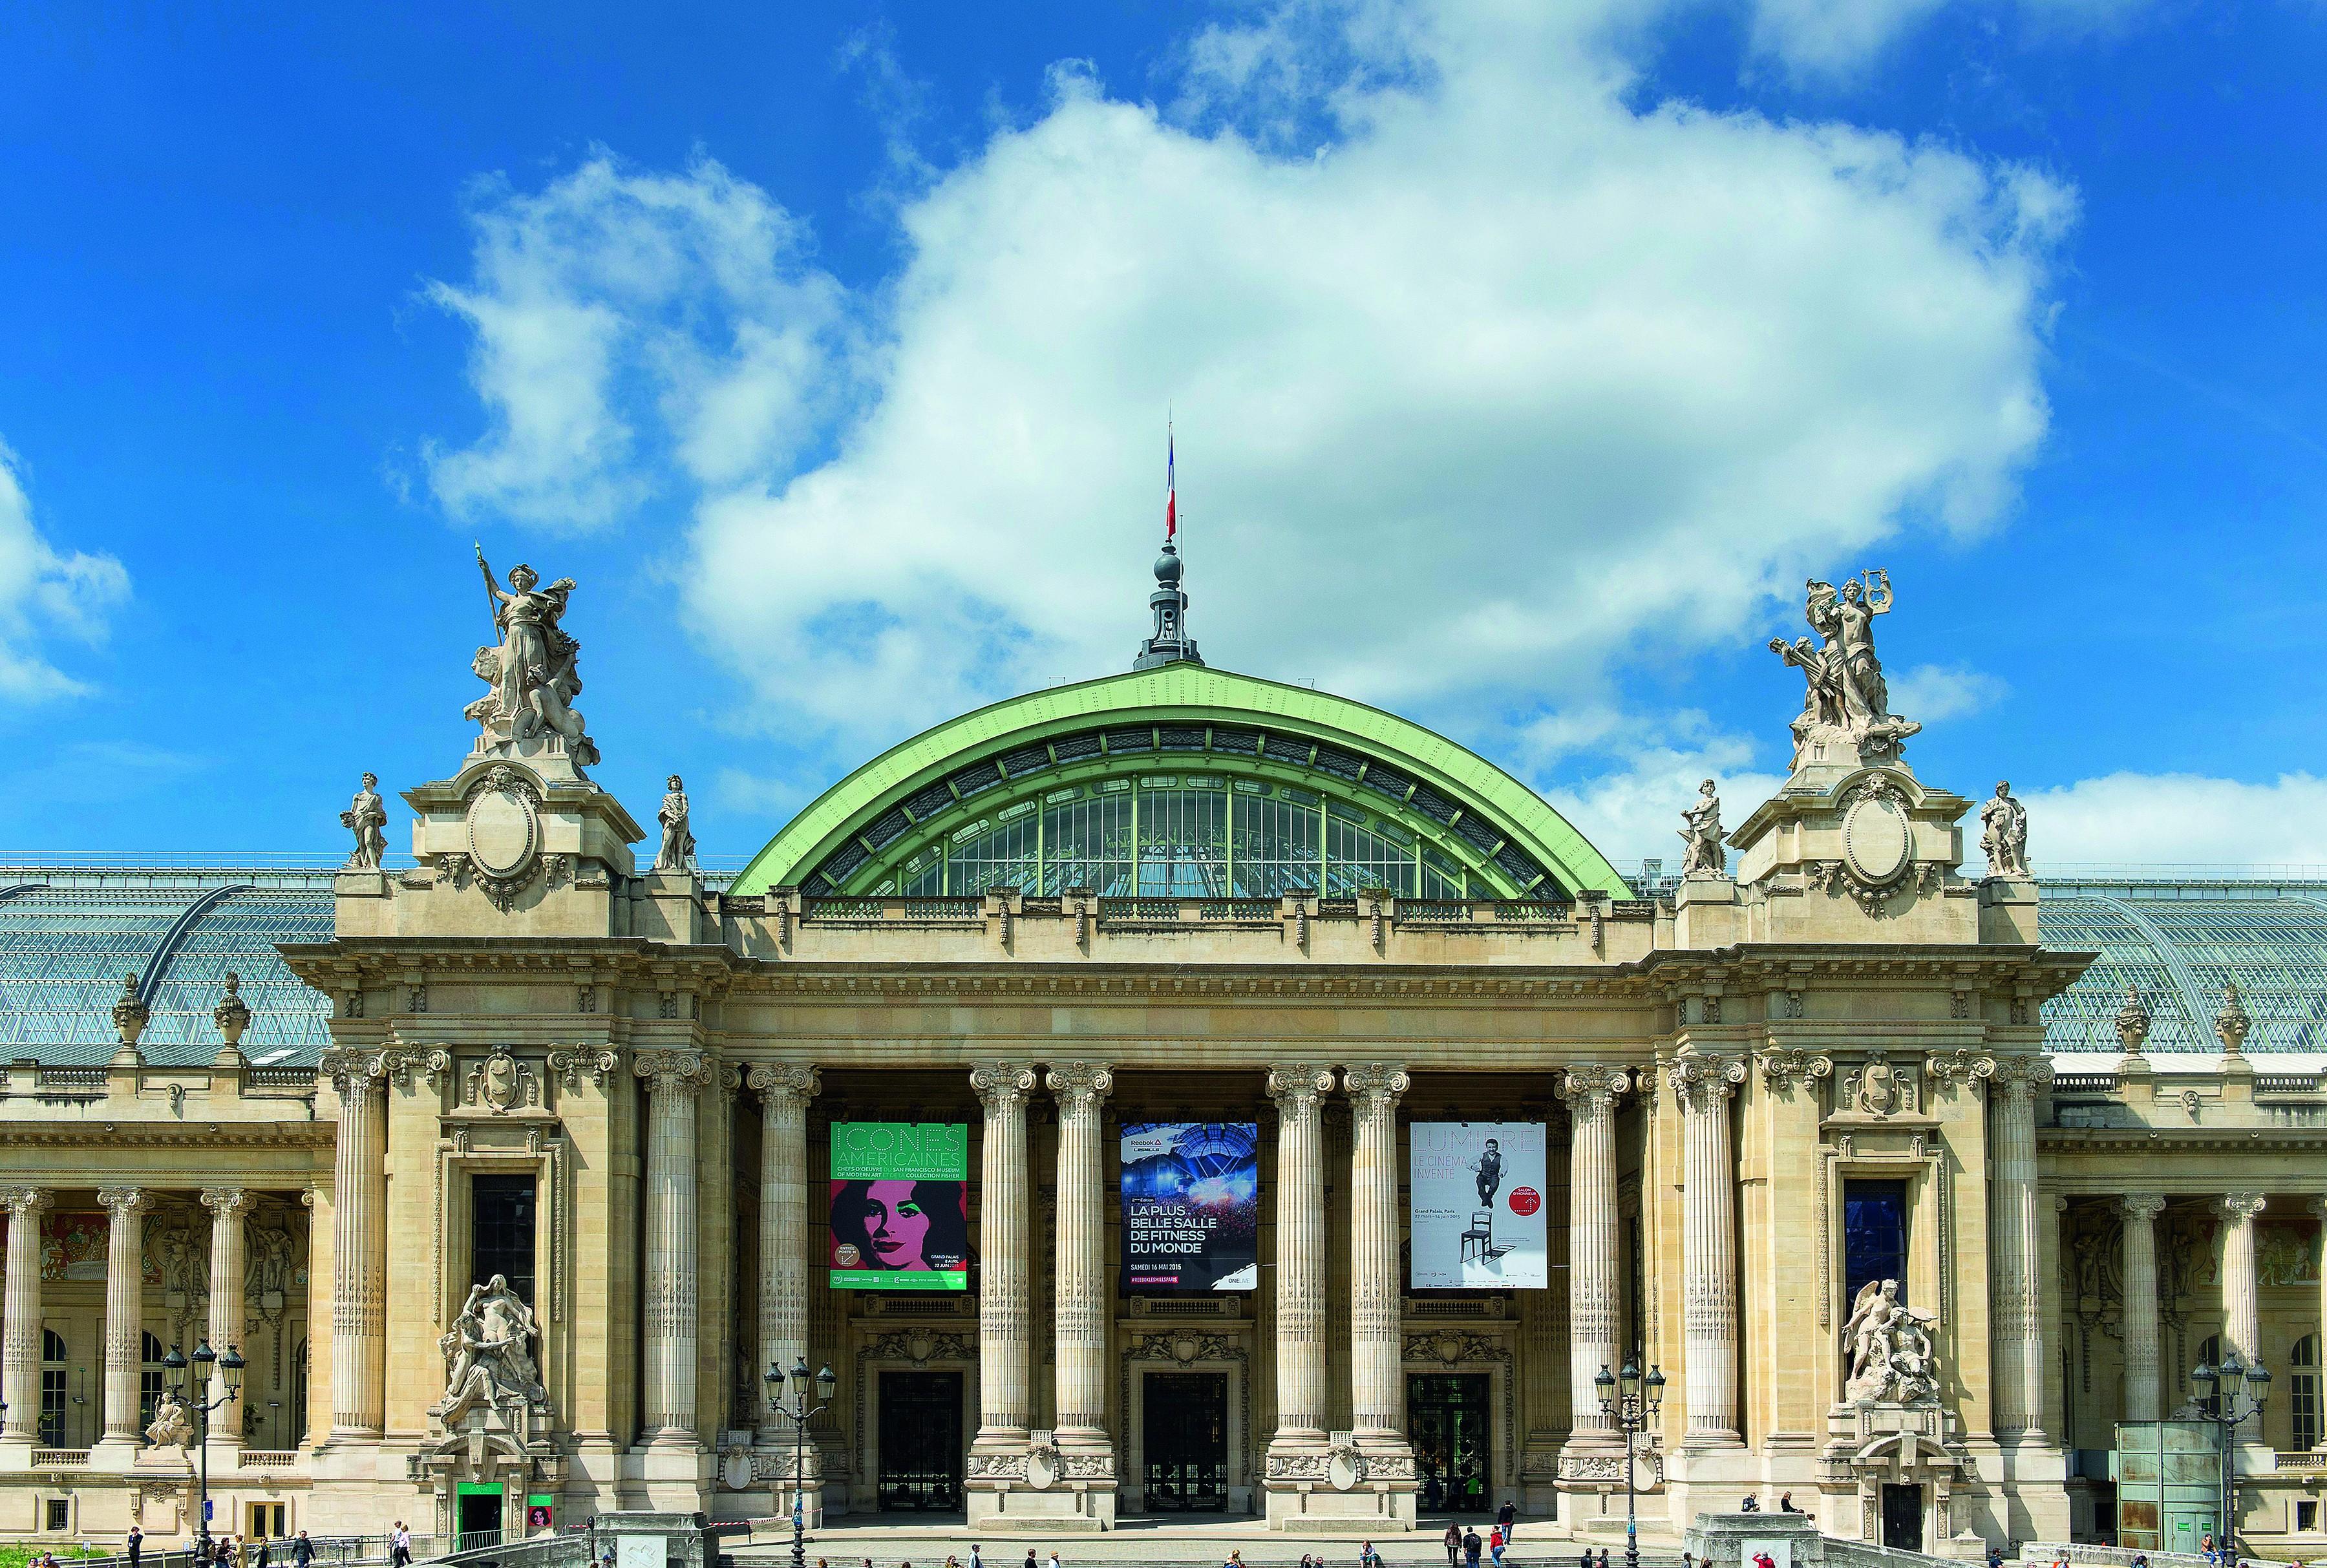 Struktur Bangunan Grand Palais